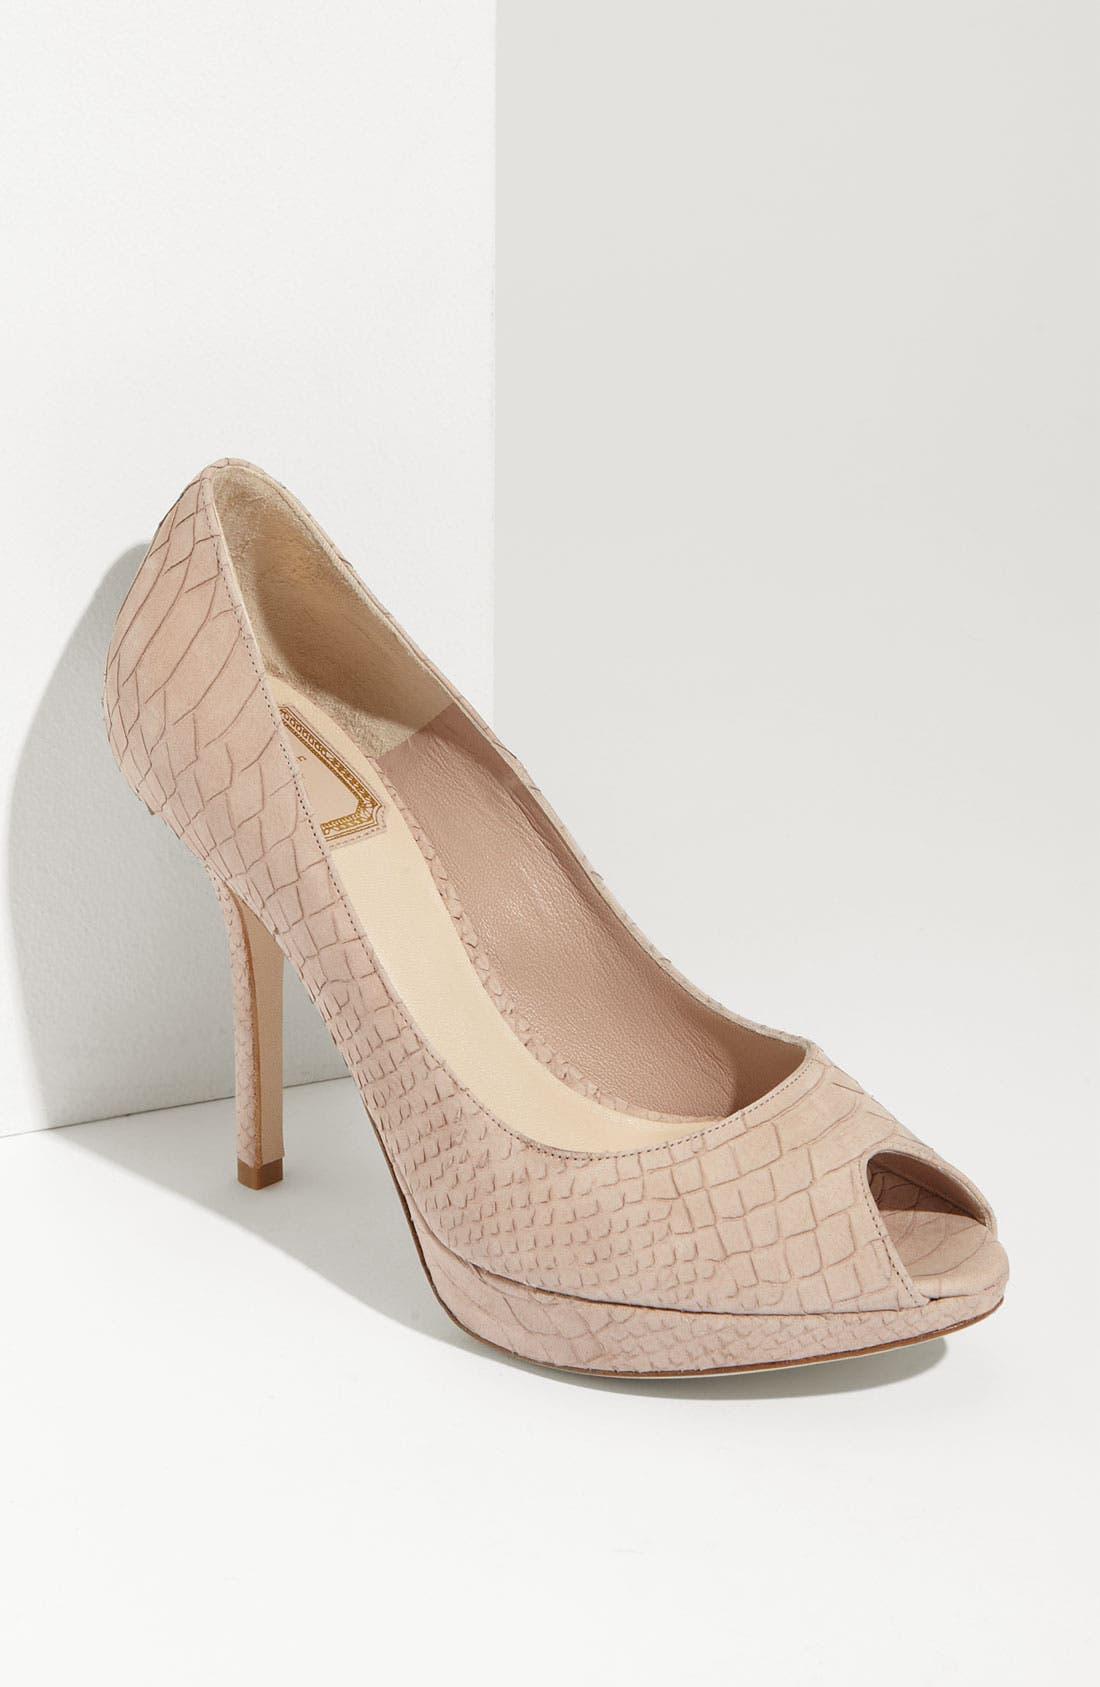 Alternate Image 1 Selected - Dior 'Miss Dior' Peep Toe Pump